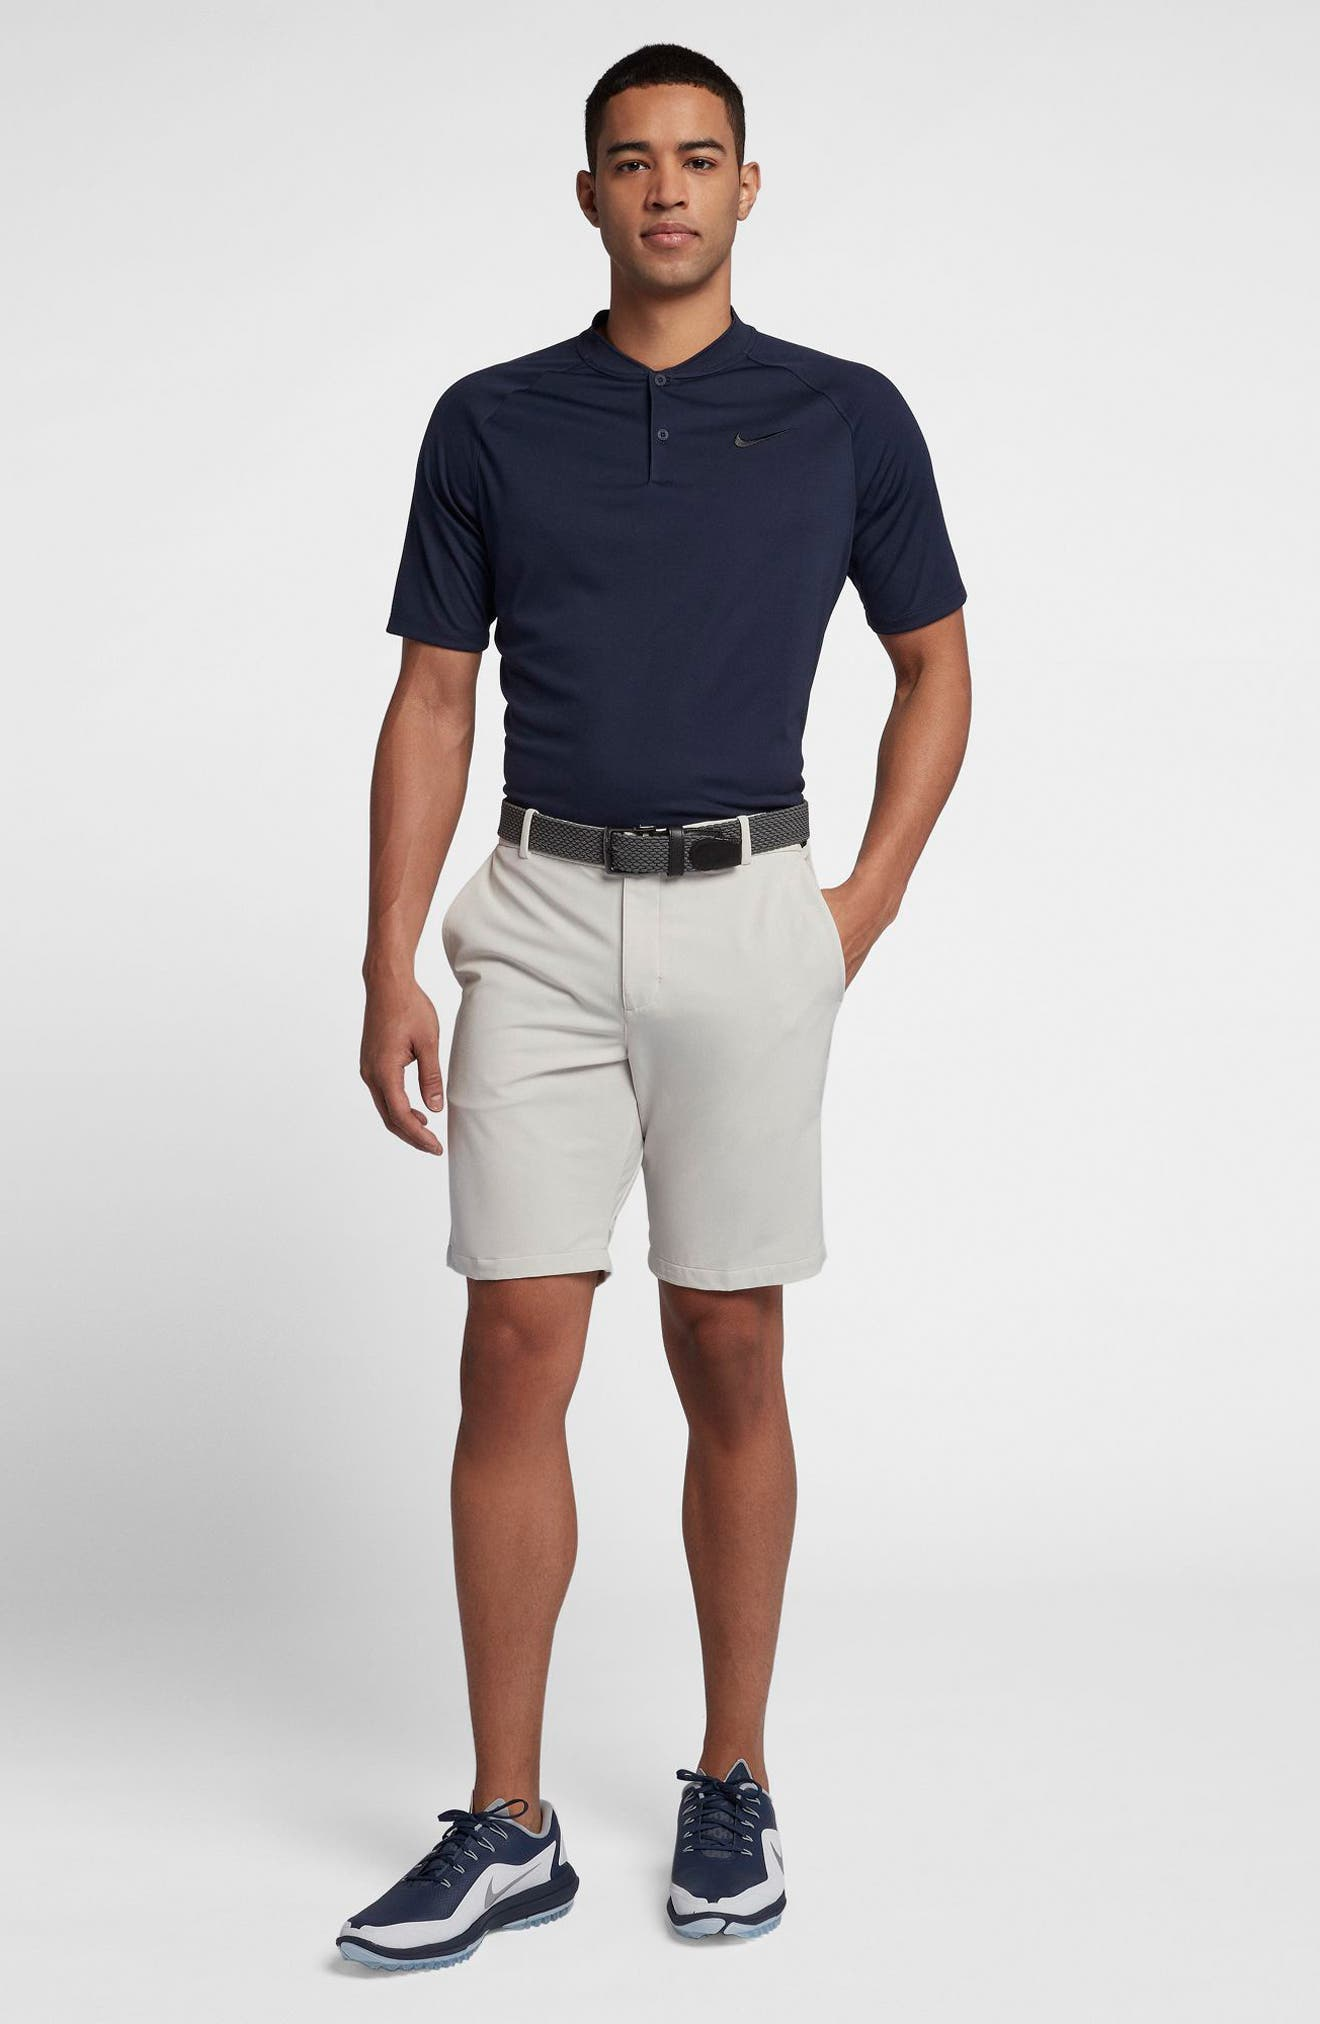 Dry Momentum Golf Polo,                             Alternate thumbnail 8, color,                             COLLEGE NAVY/ WHITE